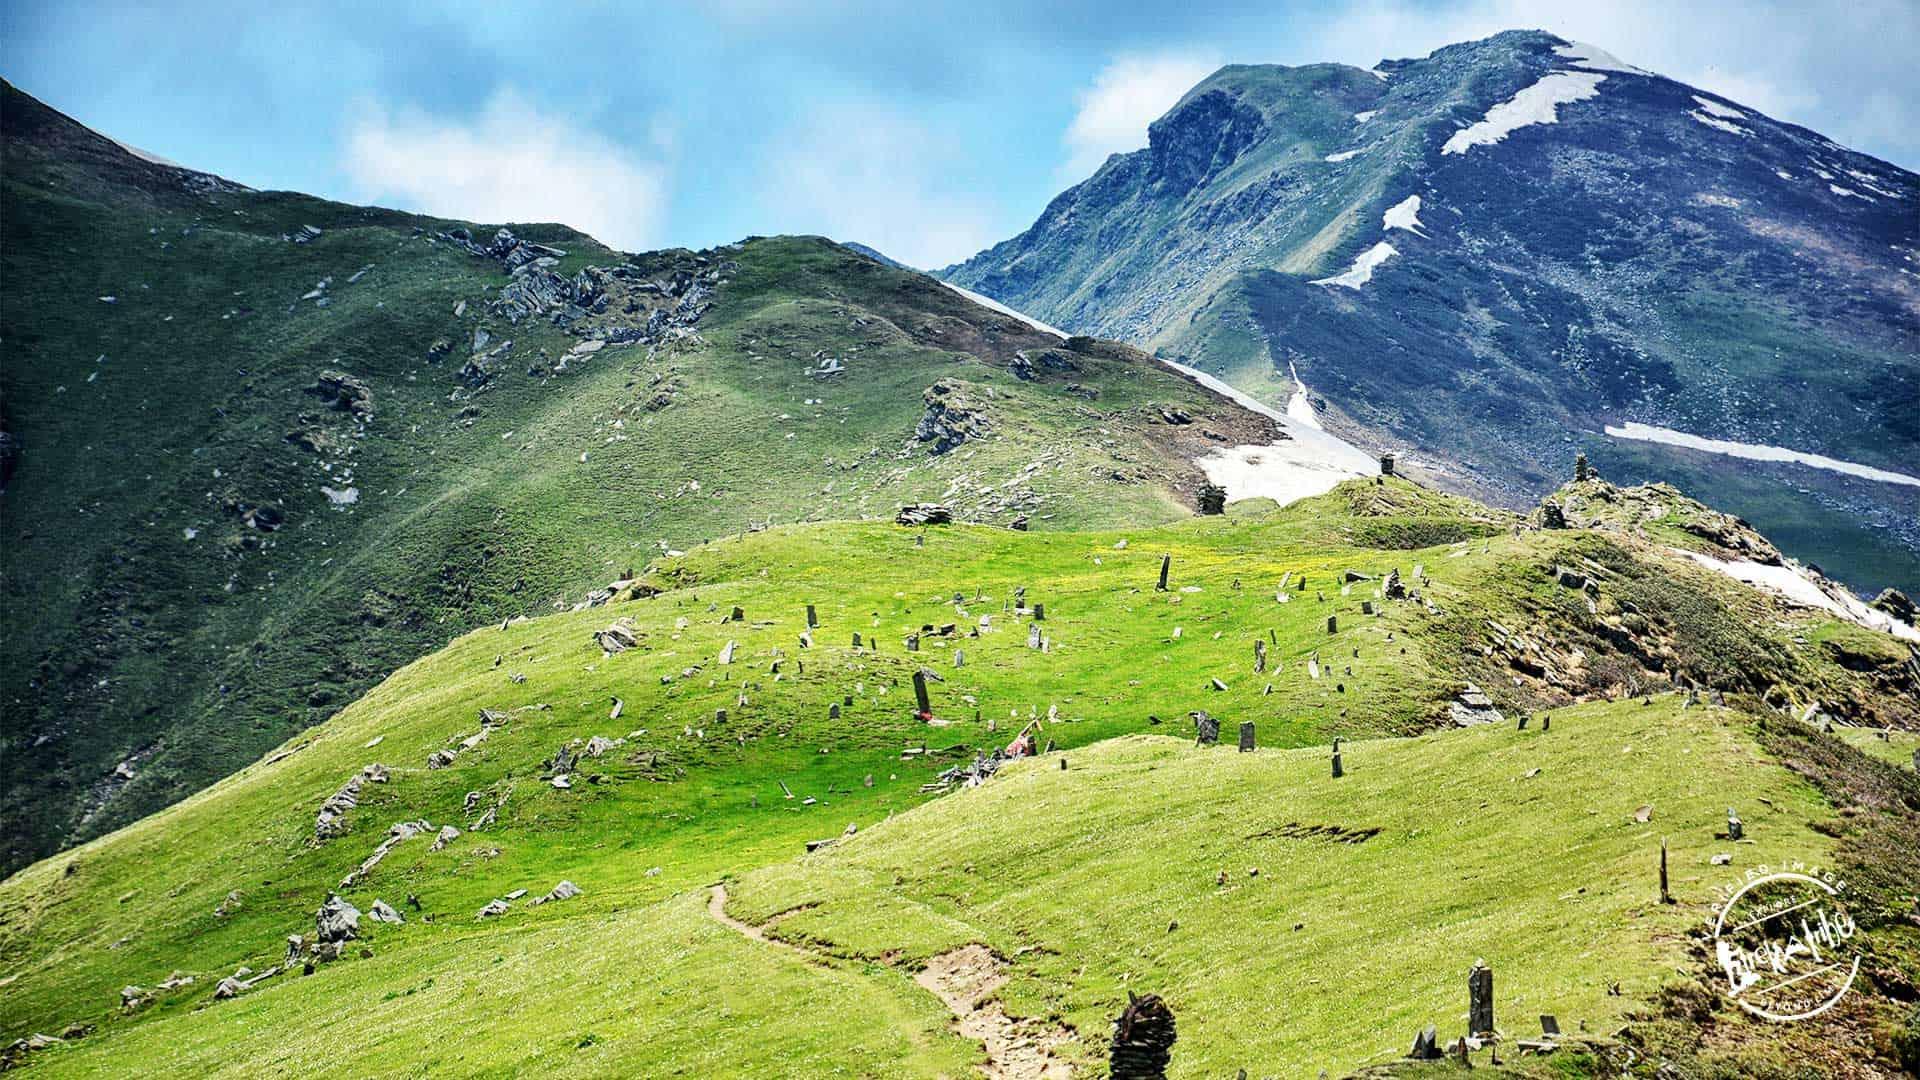 Chandrakhani pass Trek - Garden of Stones